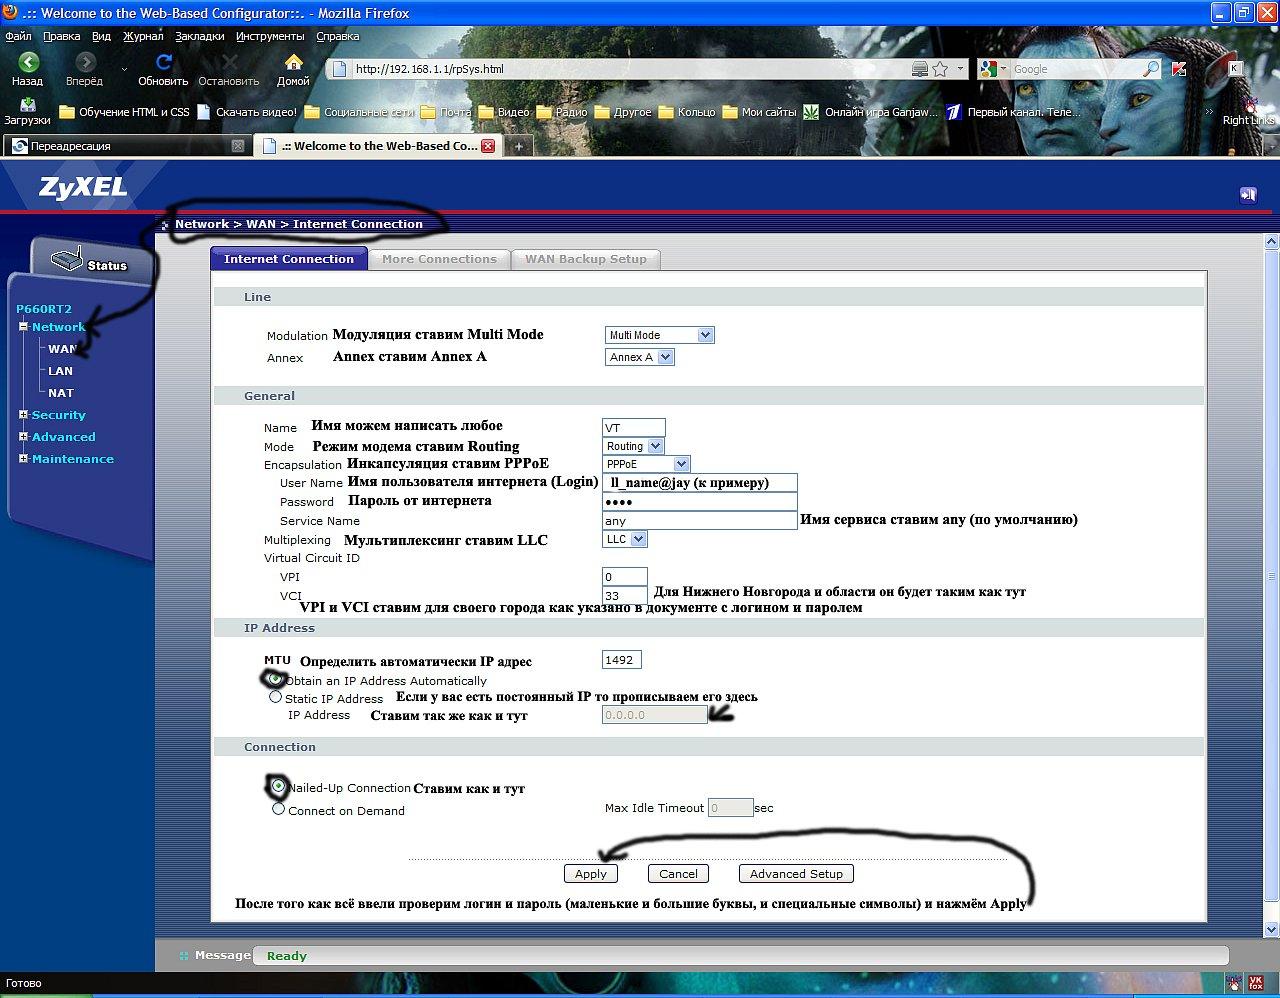 Настройка модема adsl2+ annex a/b zyxel p-660rt2 ee с портом ethernet